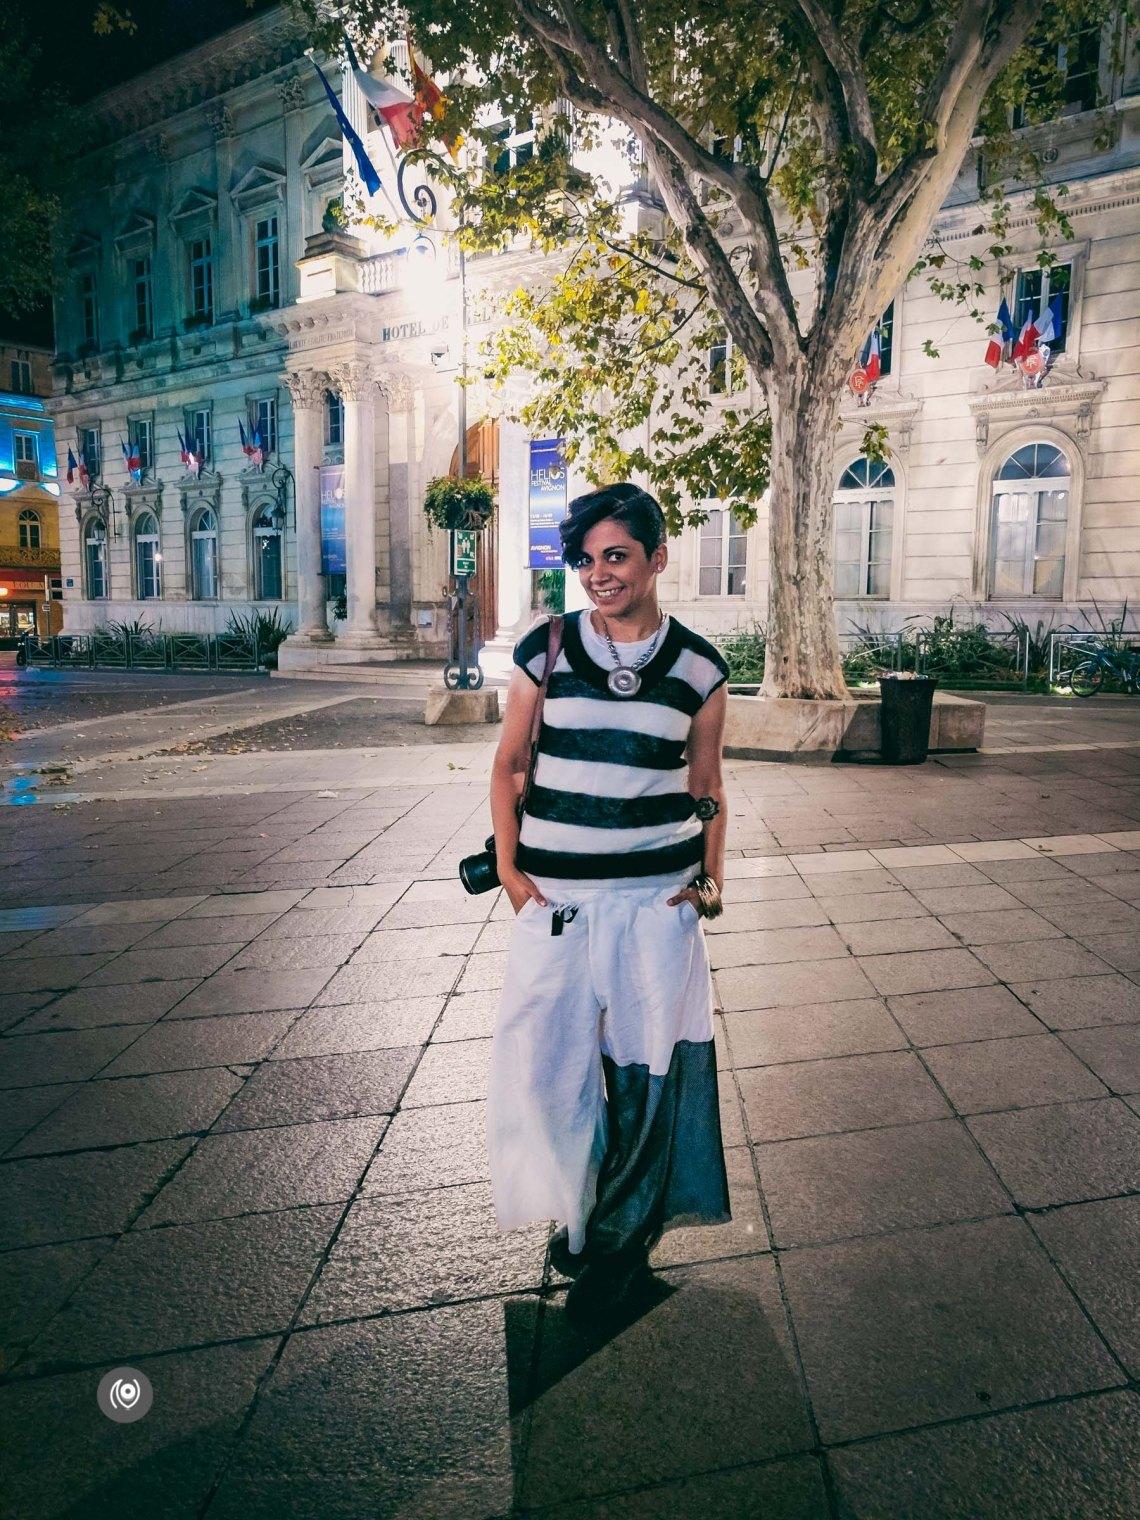 Naina.co, Naina Redhu, Personal Style, Photographer Style, CoverUp, What I Wore, EyesForParis, EyesForFrance, Fashion Choices, Garments, Ensembles, Travel Fashion, Travel Style, Travel Photographer, Travel Blogger, EyesForDestinations